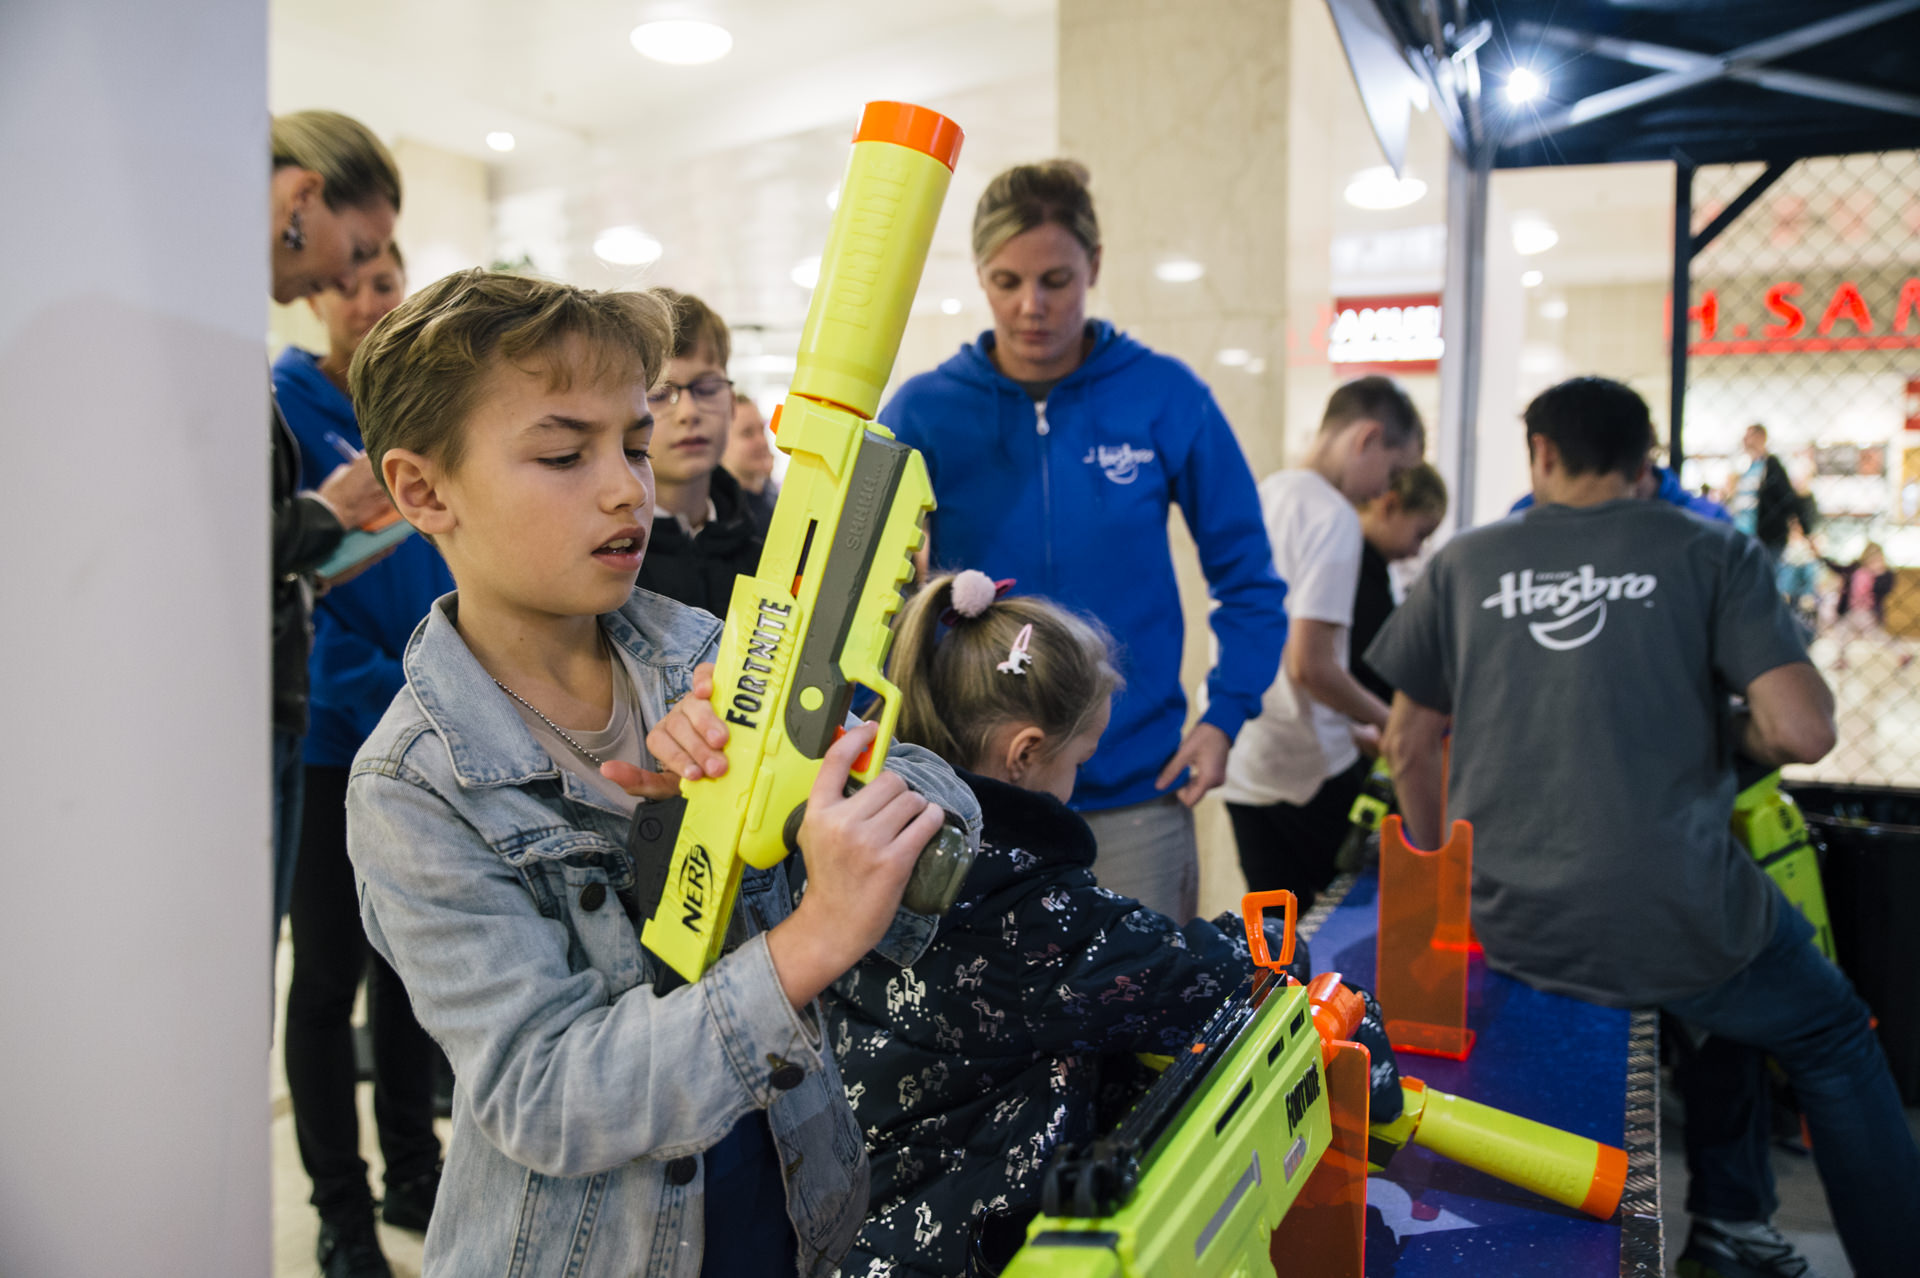 a kid loading nerf toy gun